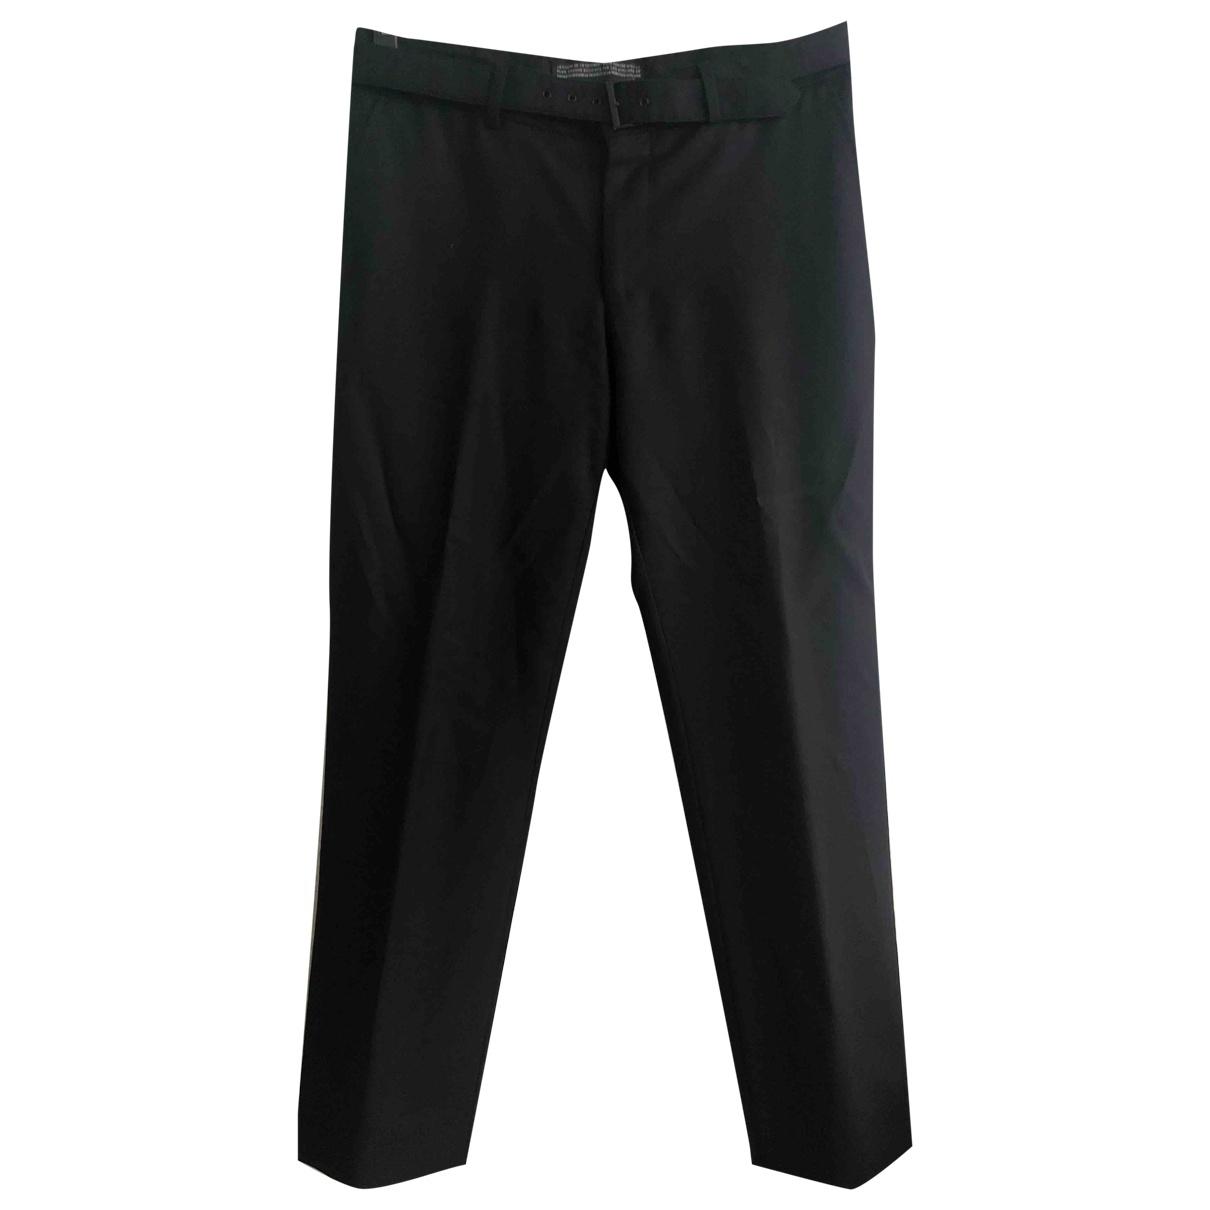 Pantalon de Lana The Kooples